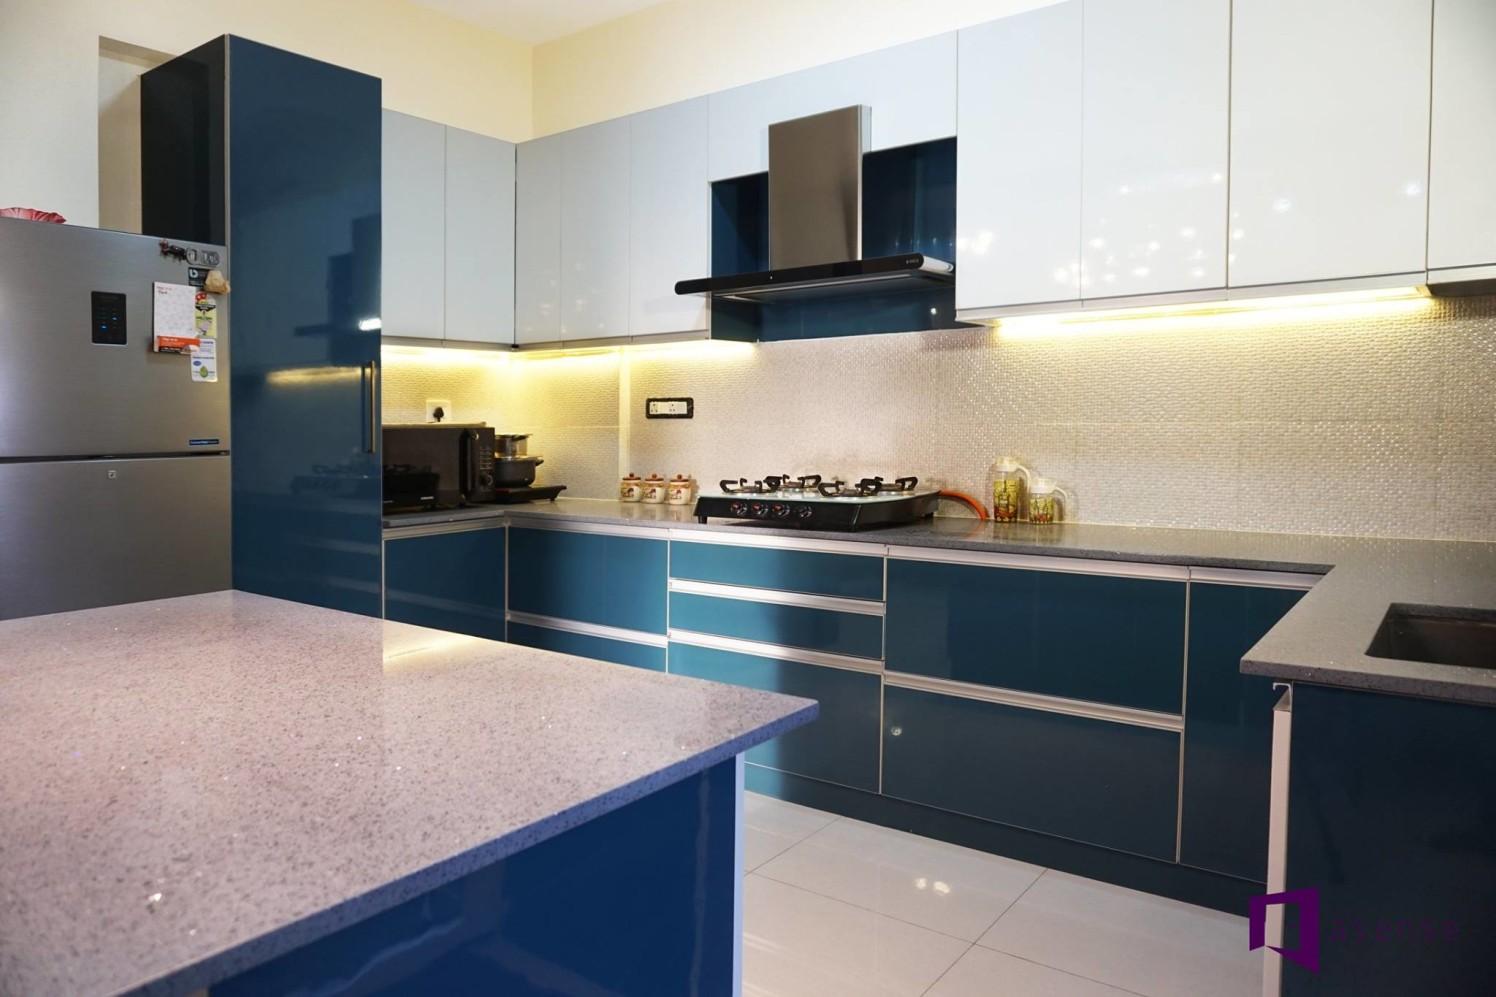 Blue And White Modular Kitchen by Snigdha Ghosh Modular-kitchen Contemporary | Interior Design Photos & Ideas